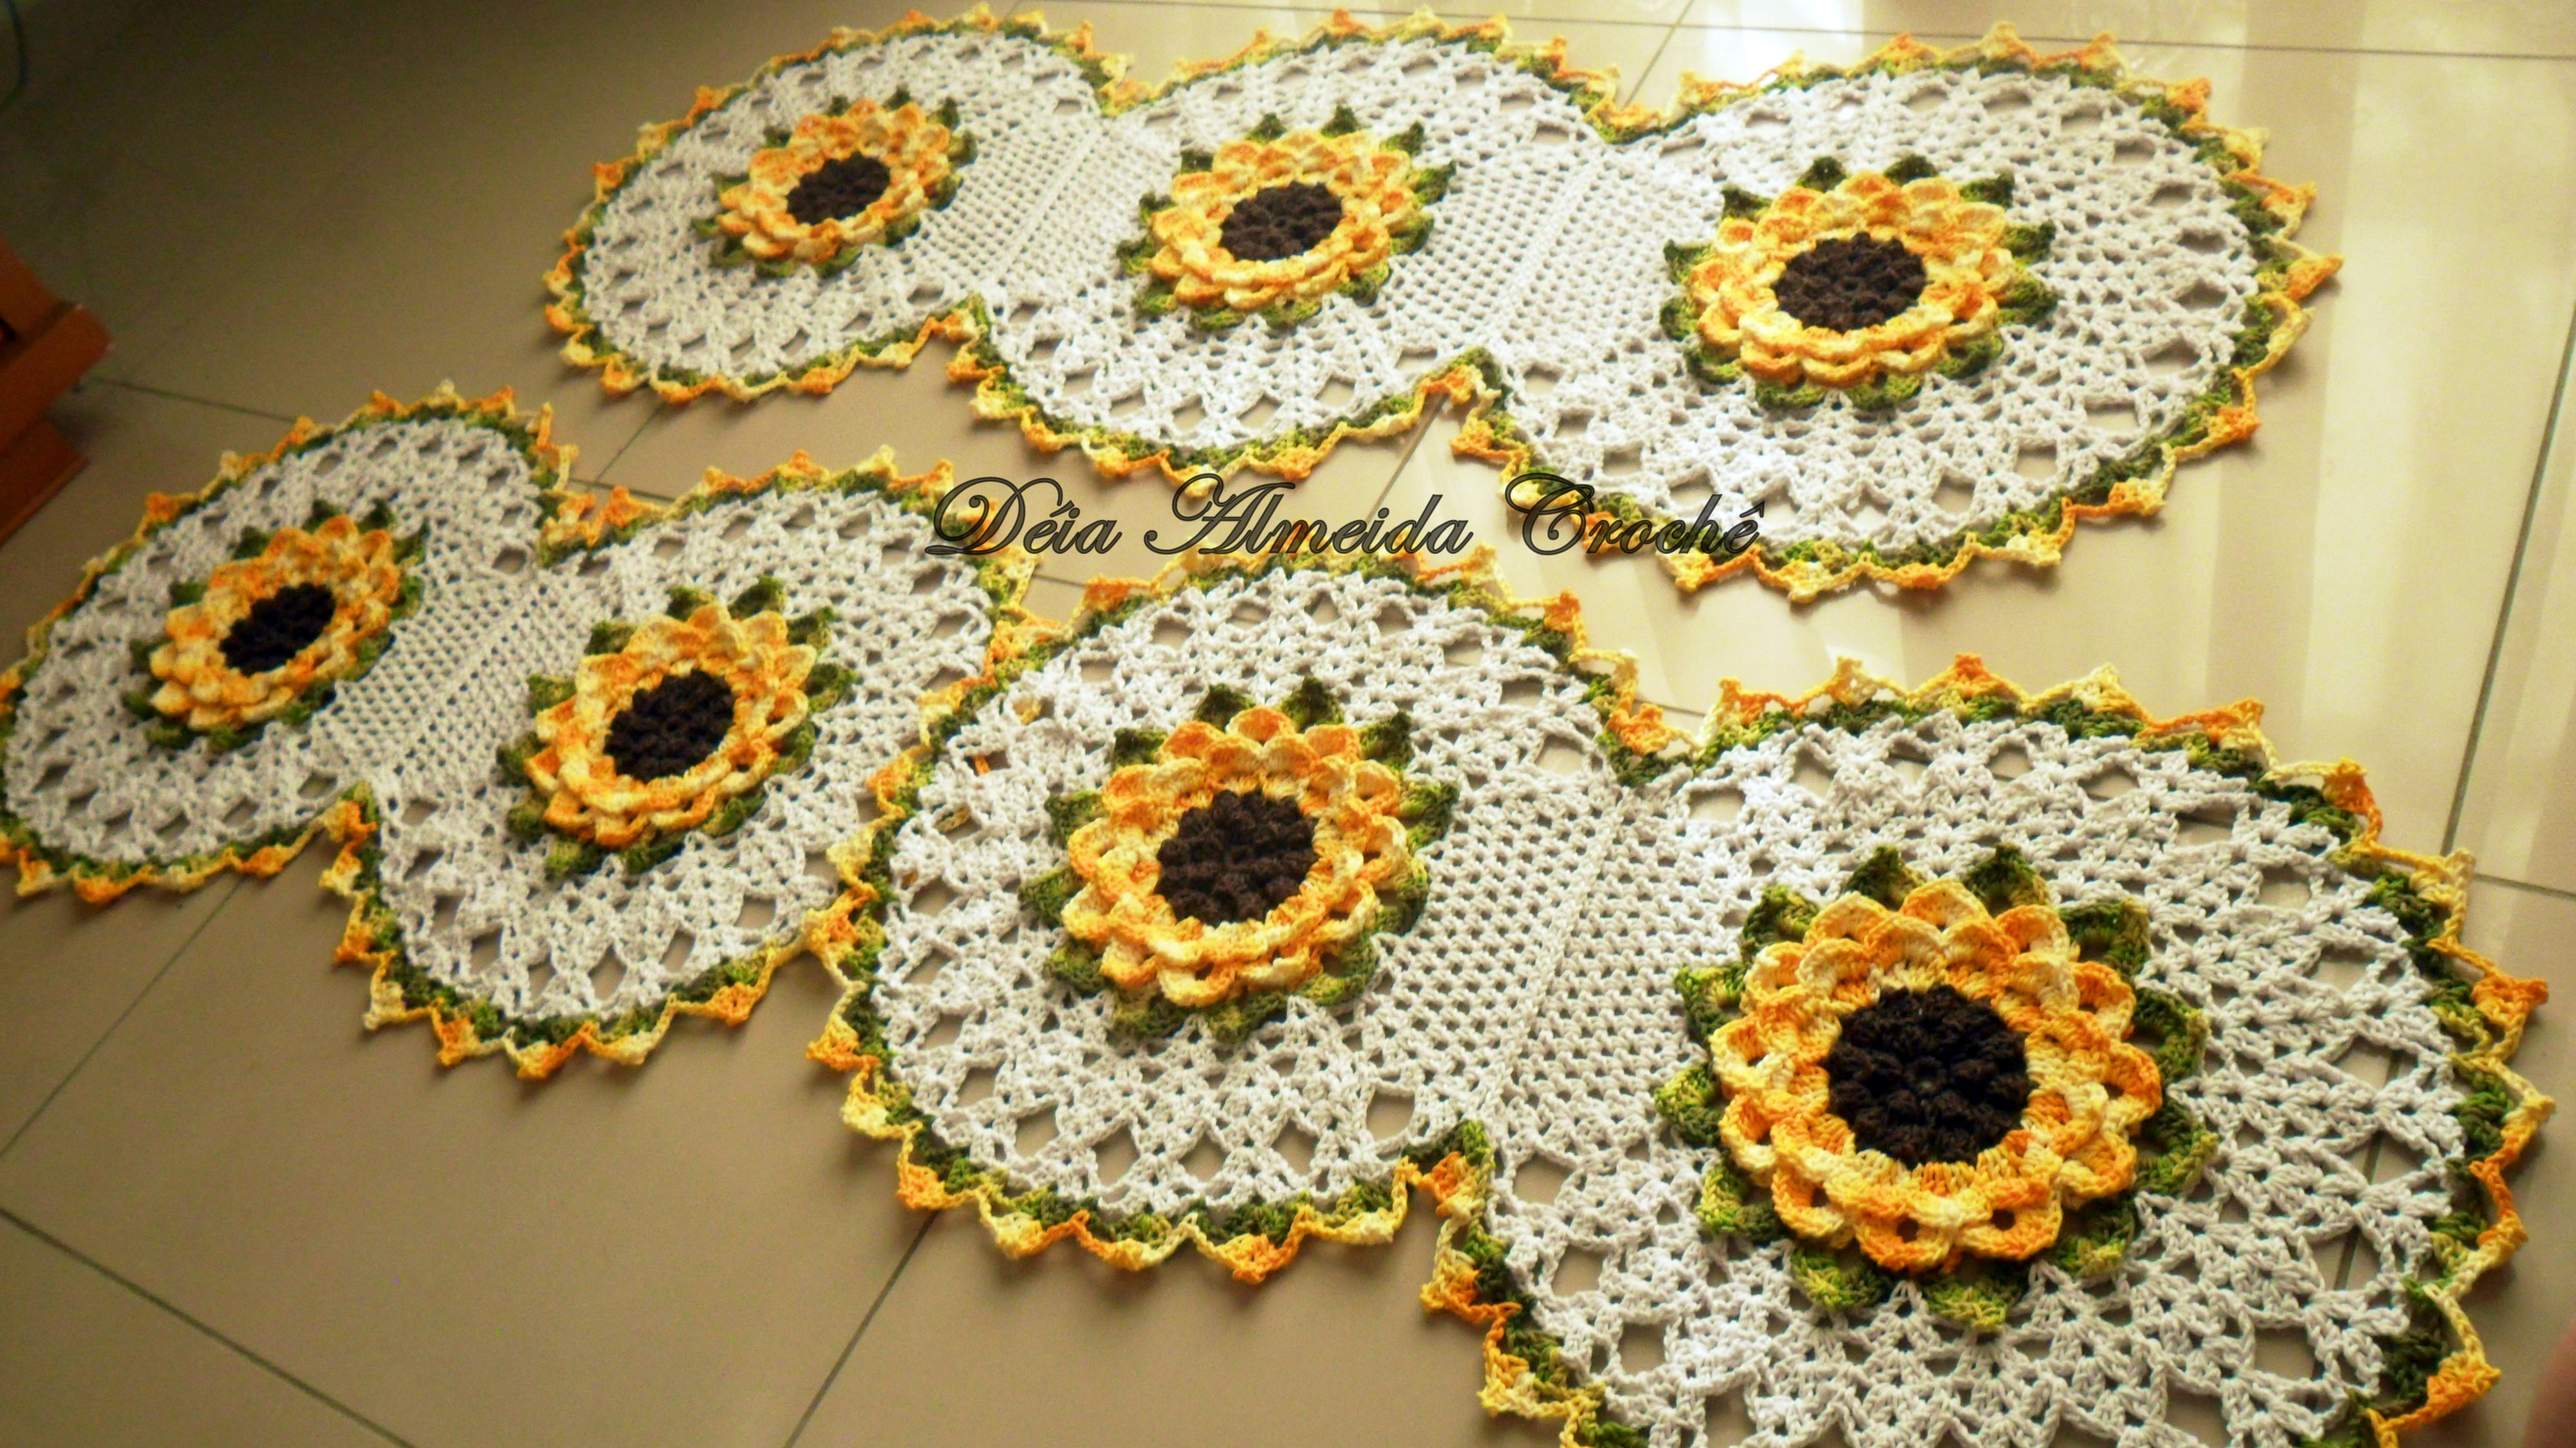 decoracao tapete cozinha : decoracao tapete cozinha:Jogo De Cozinha Girassol Jogo De Cozinha Girassol Jogo De Cozinha